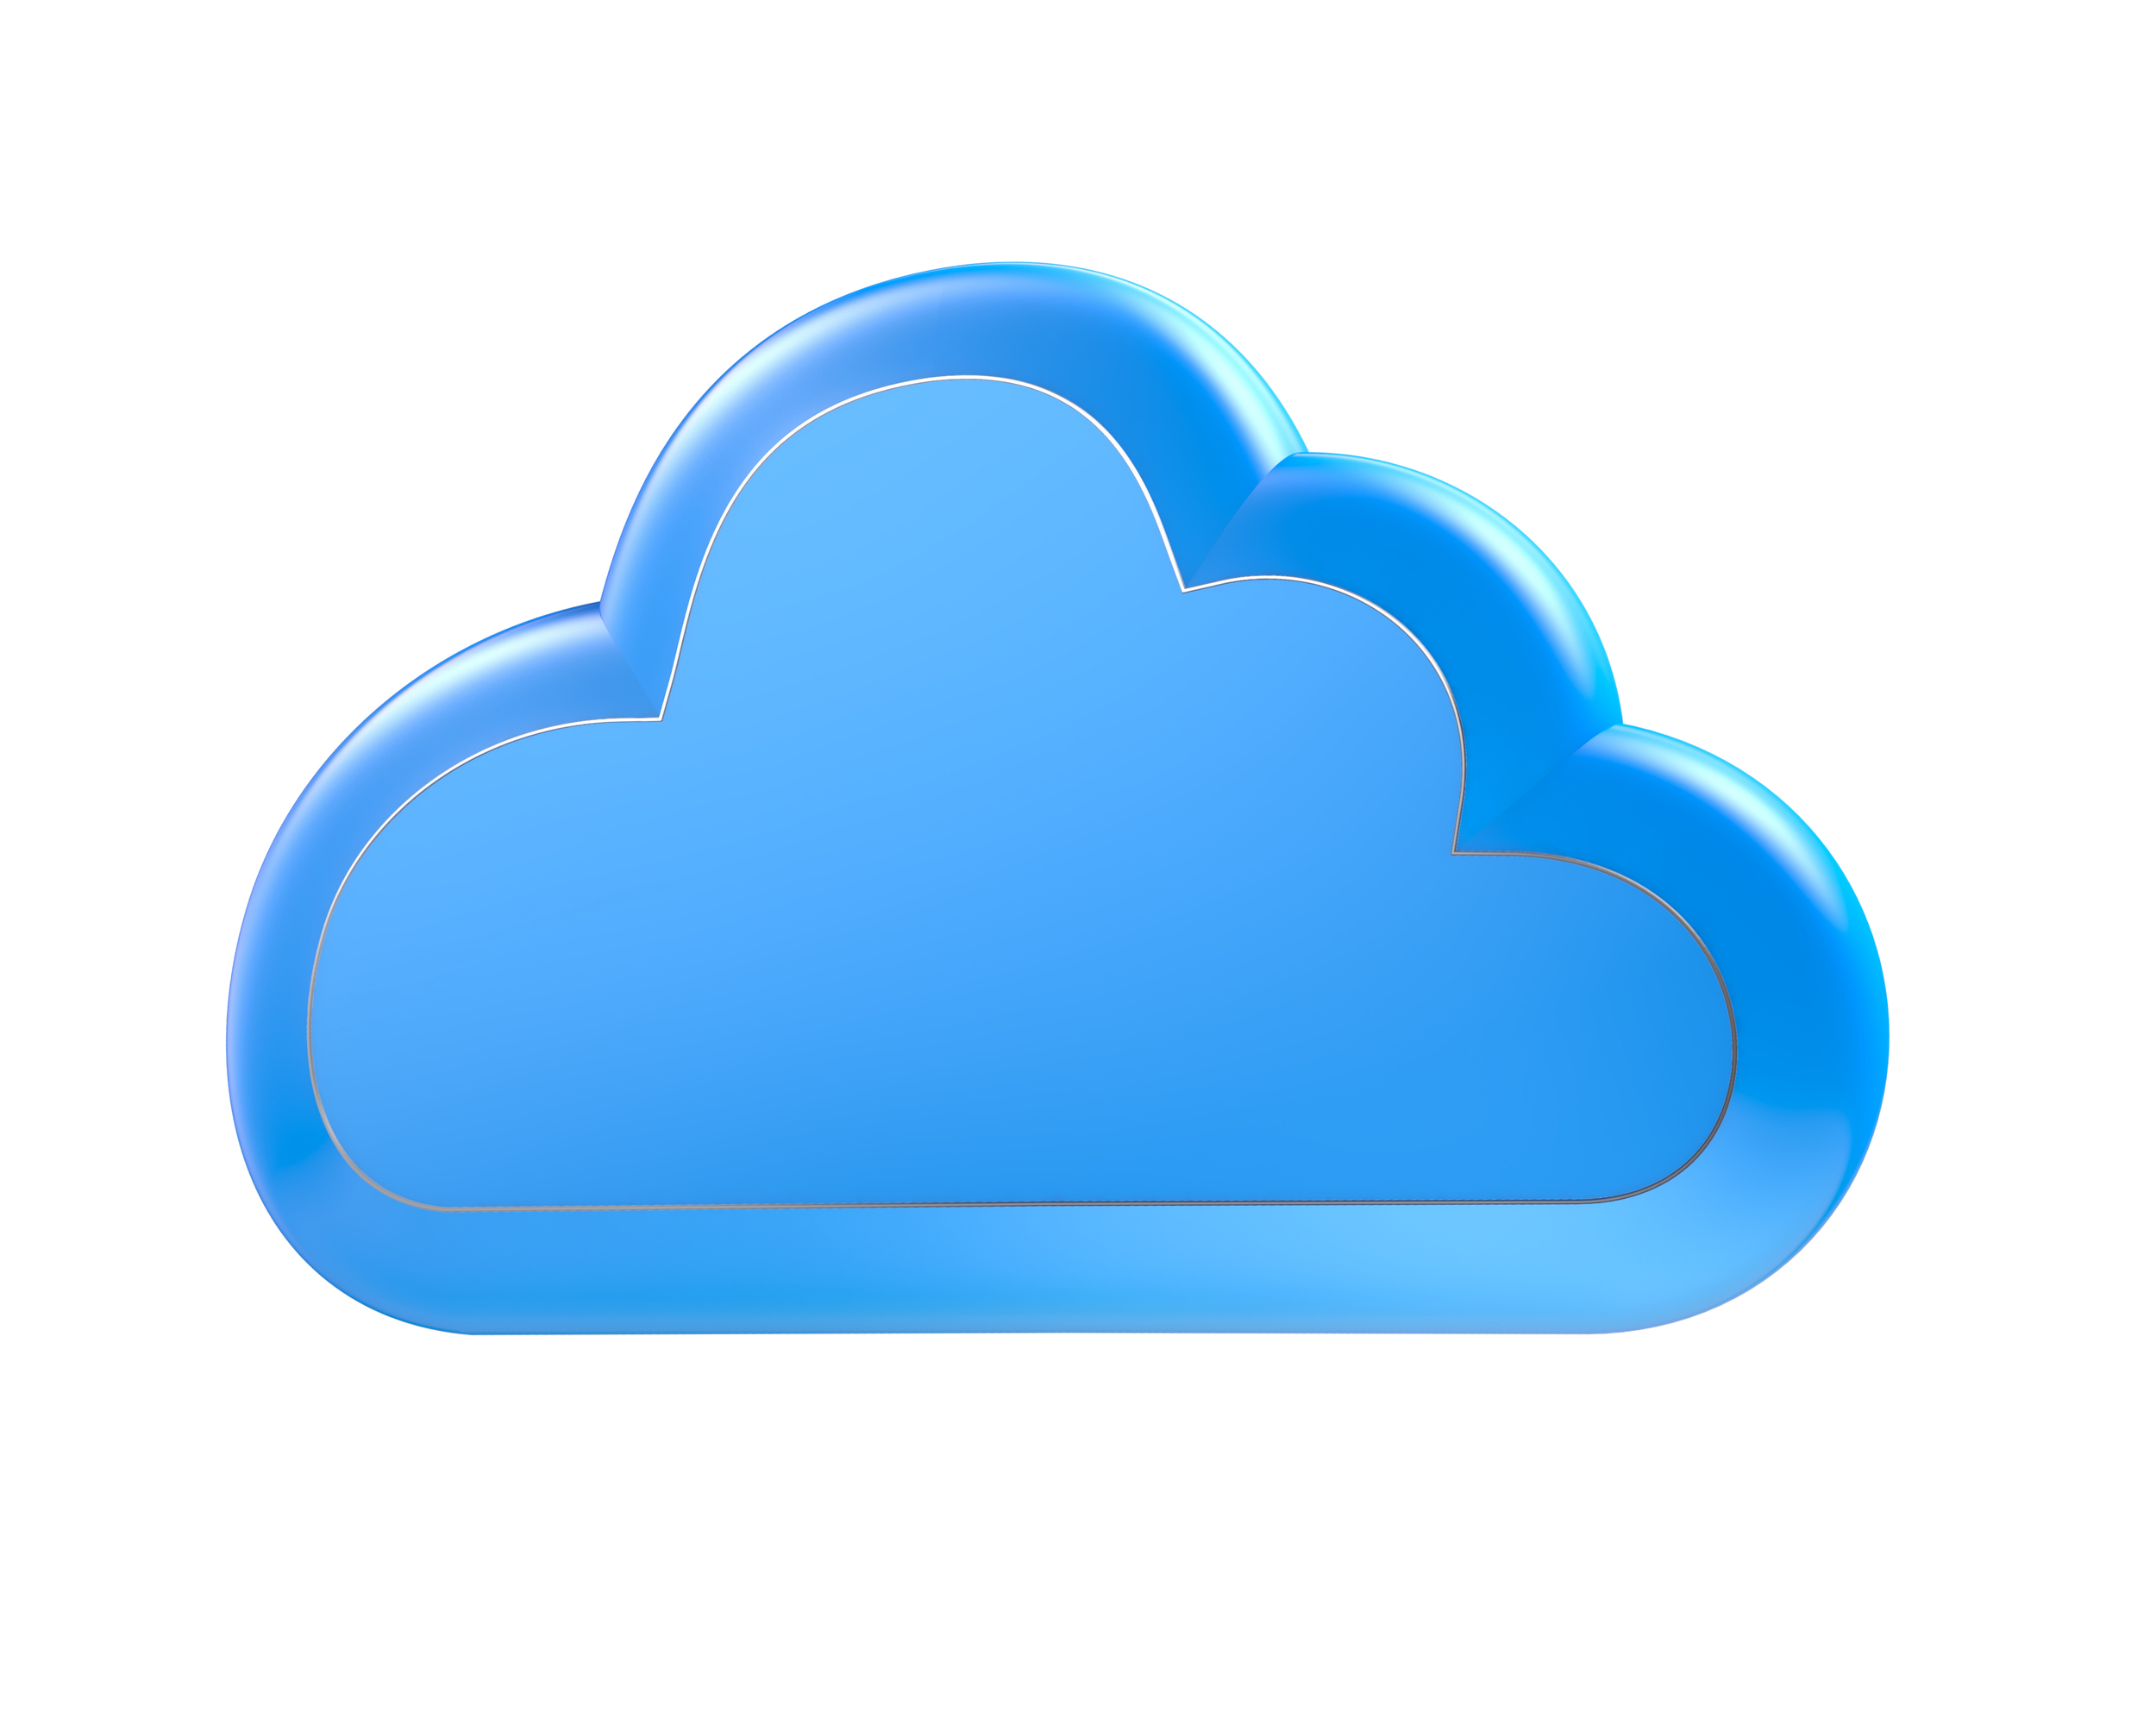 The Cloud Symbol.jpg